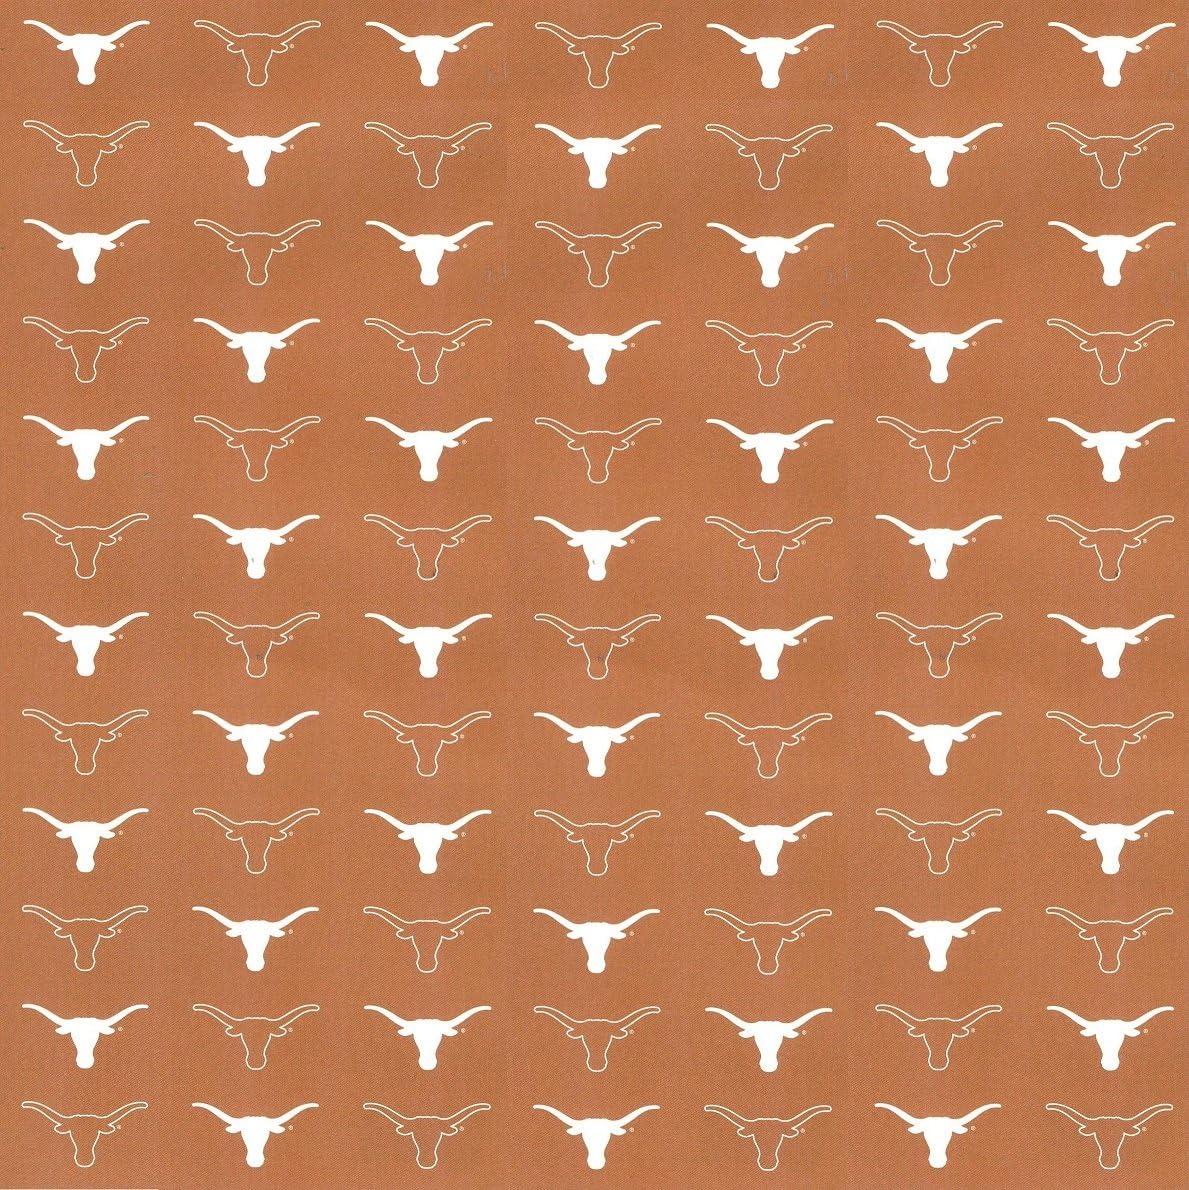 50+] Longhorn Wallpaper Background on WallpaperSafari | 1190x1189